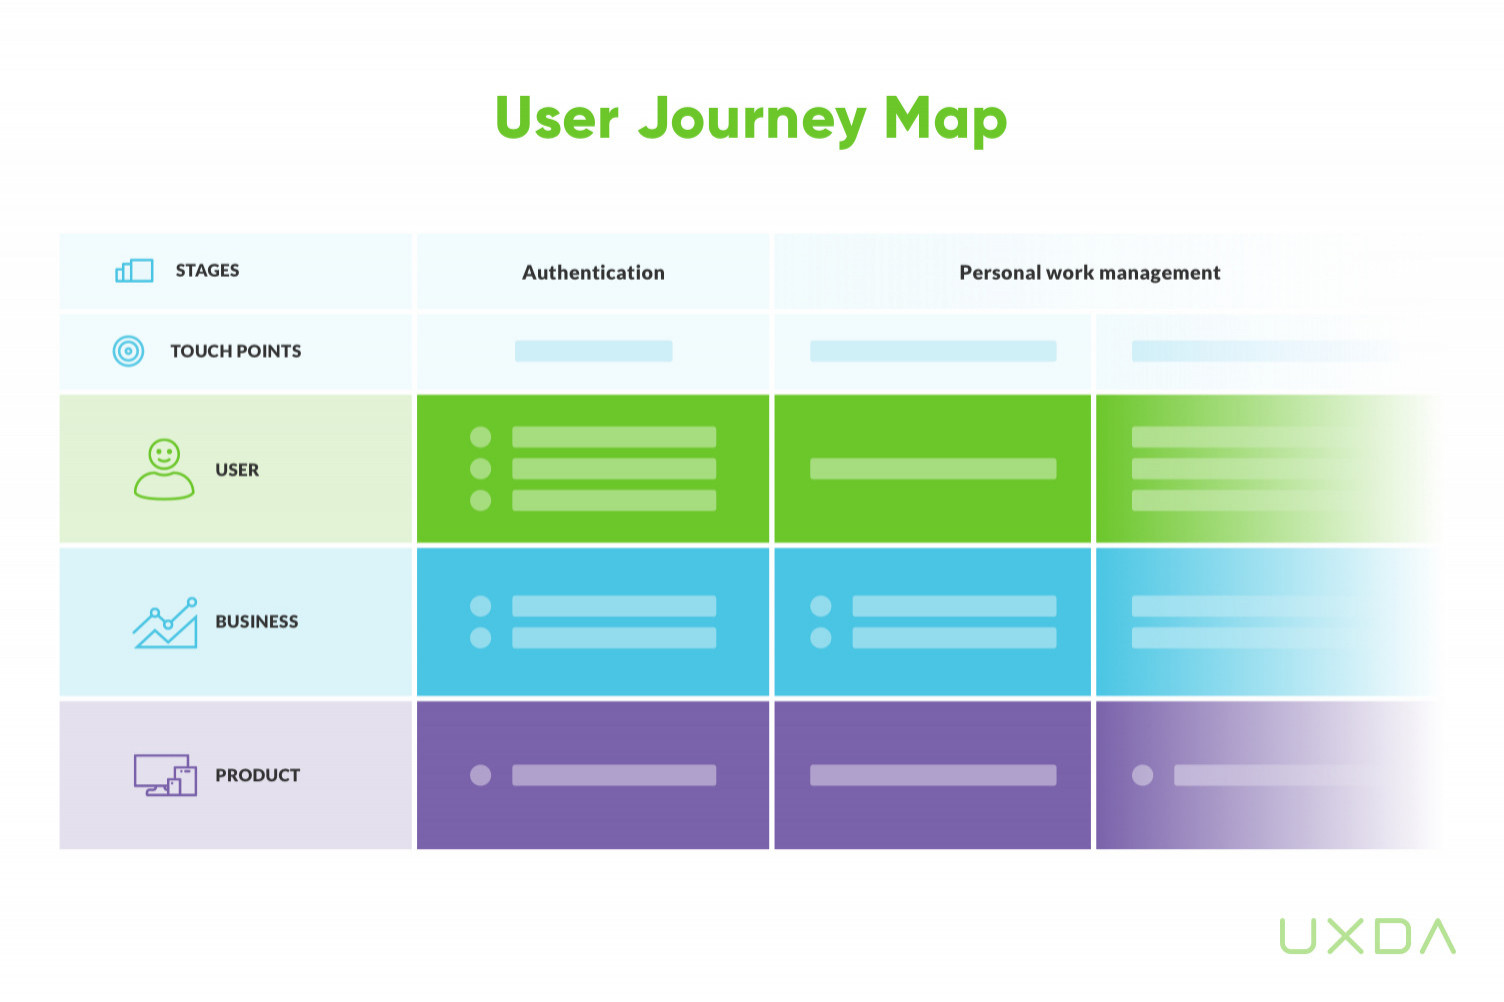 user-journey-mapping-uxda-work-process-ux-design-5.jpg